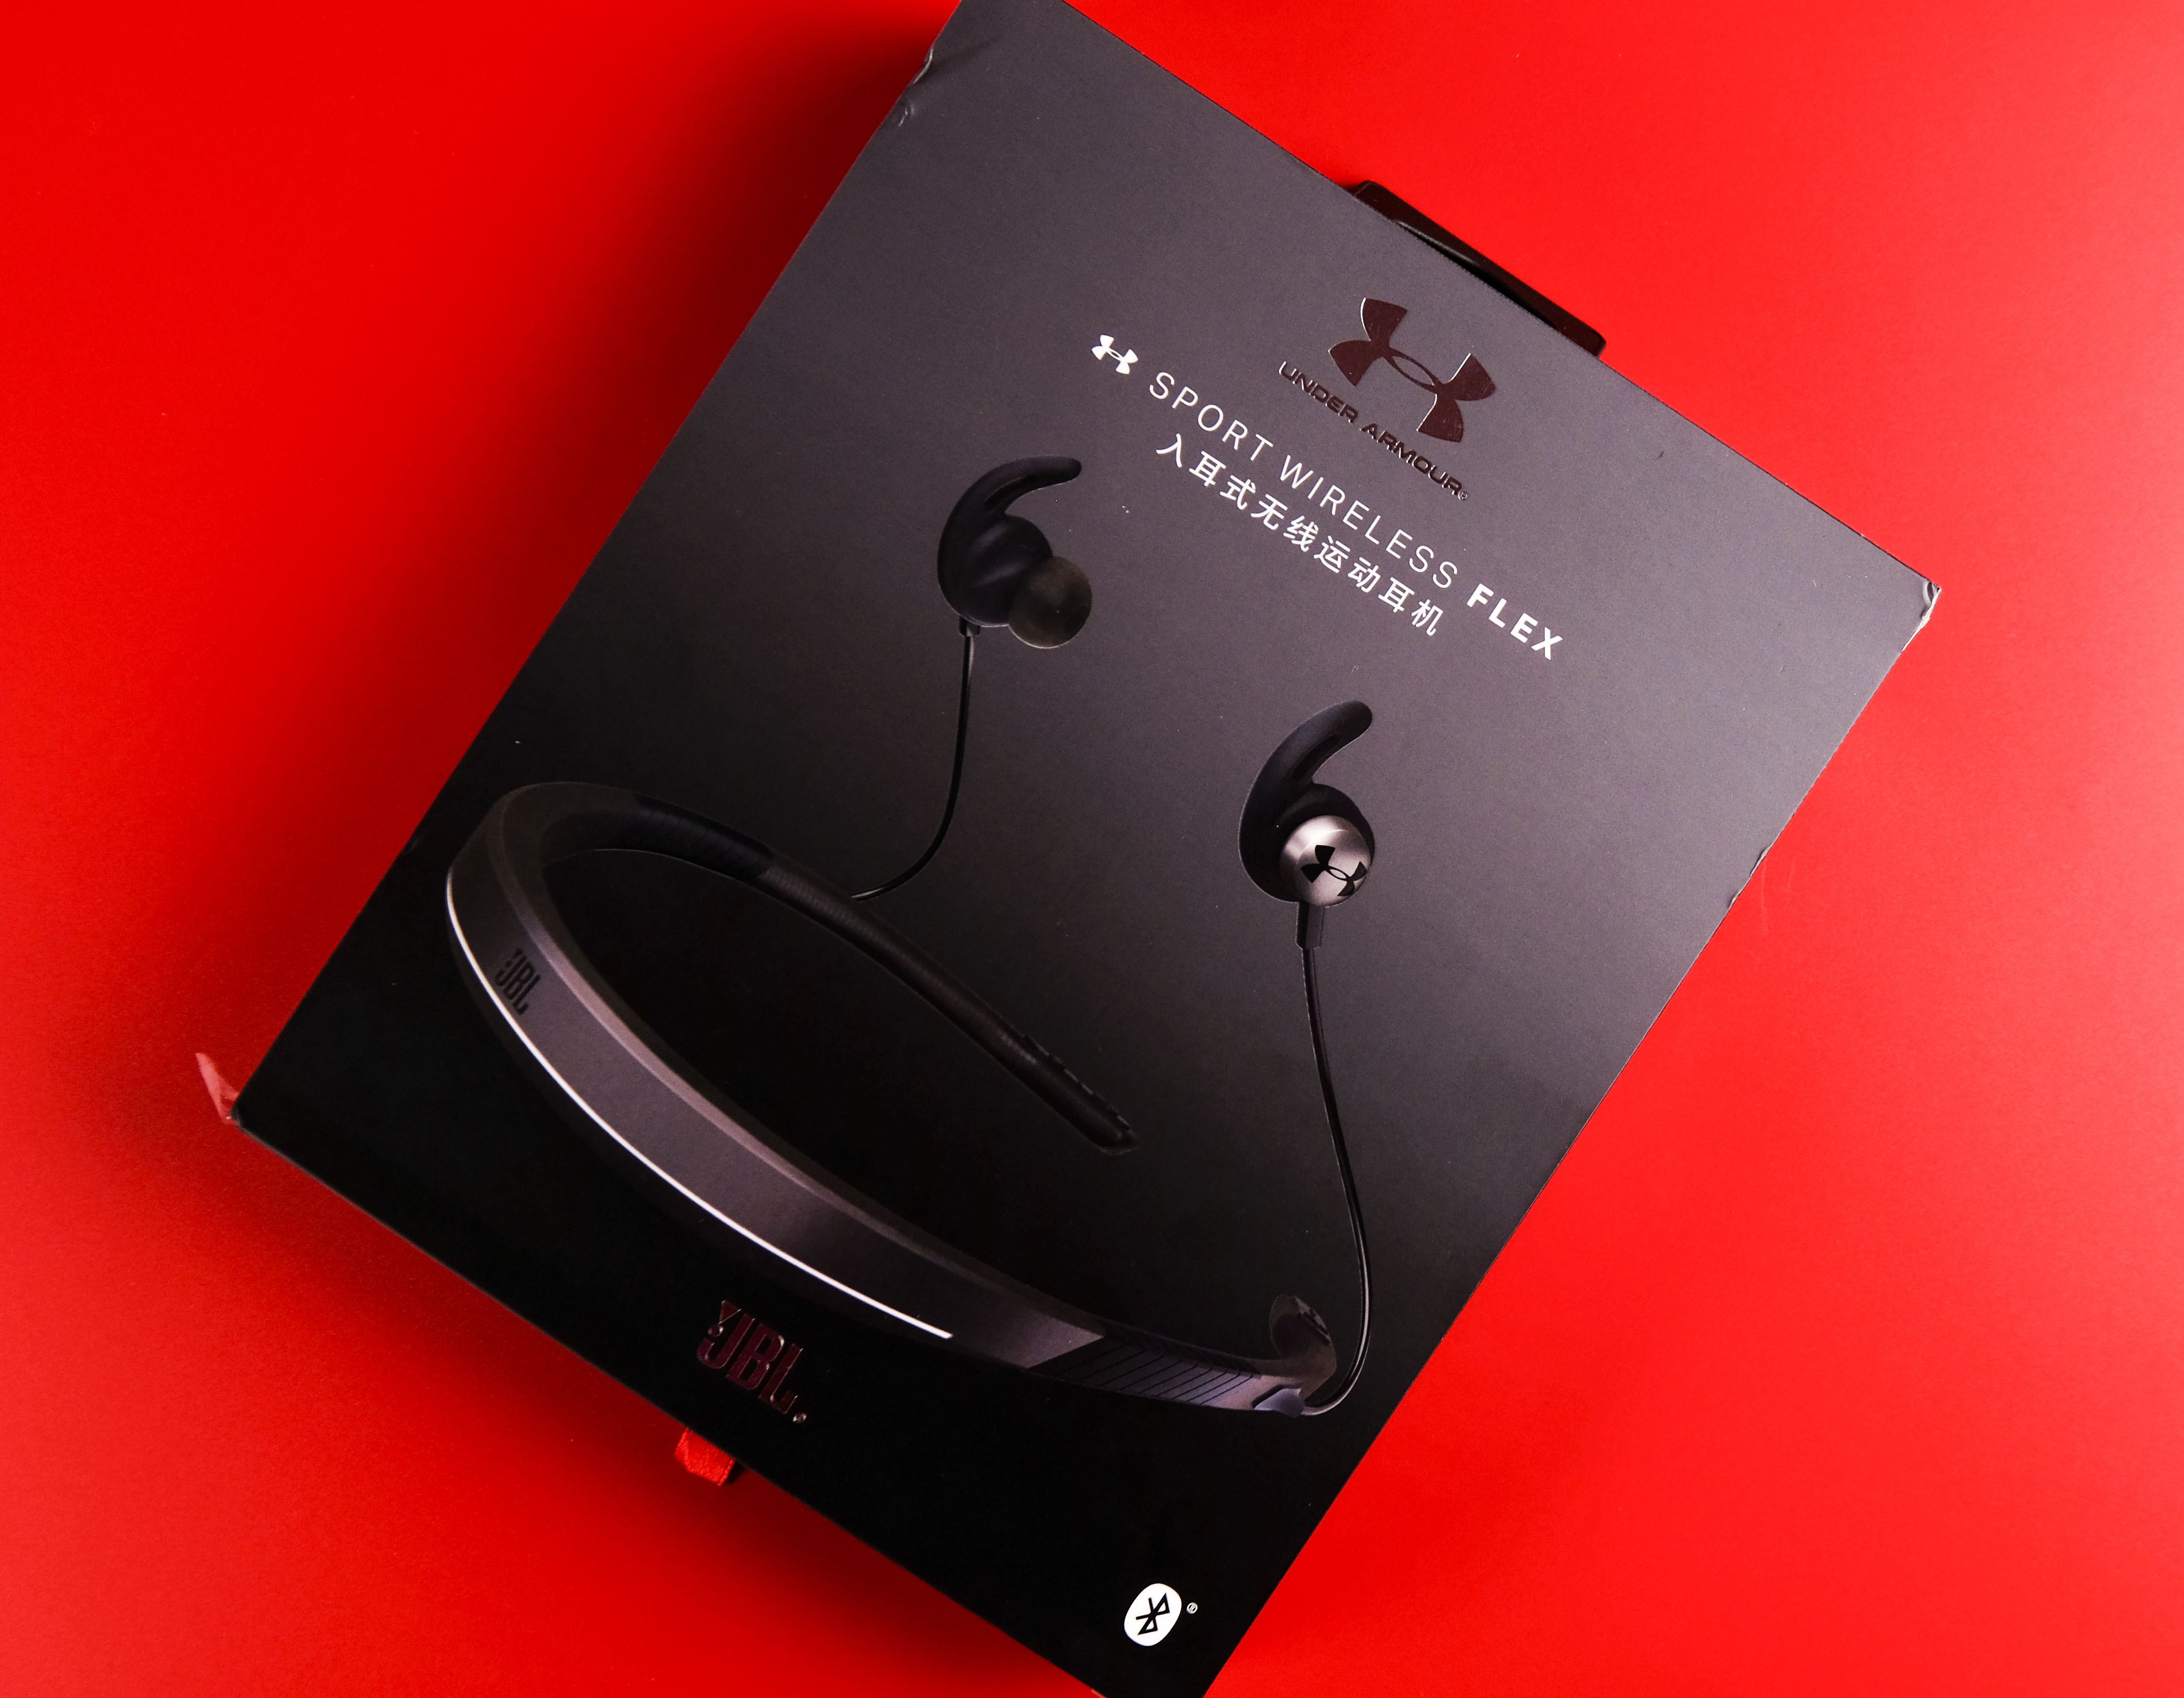 cfffa1a57cd 和上次红色包装不同,JBL X UA FLEX蓝牙无线运动耳机的包装改用黑色,Under Armour 品牌LOGO放在了显眼位置,打开方式从书页式改为抽拉式。